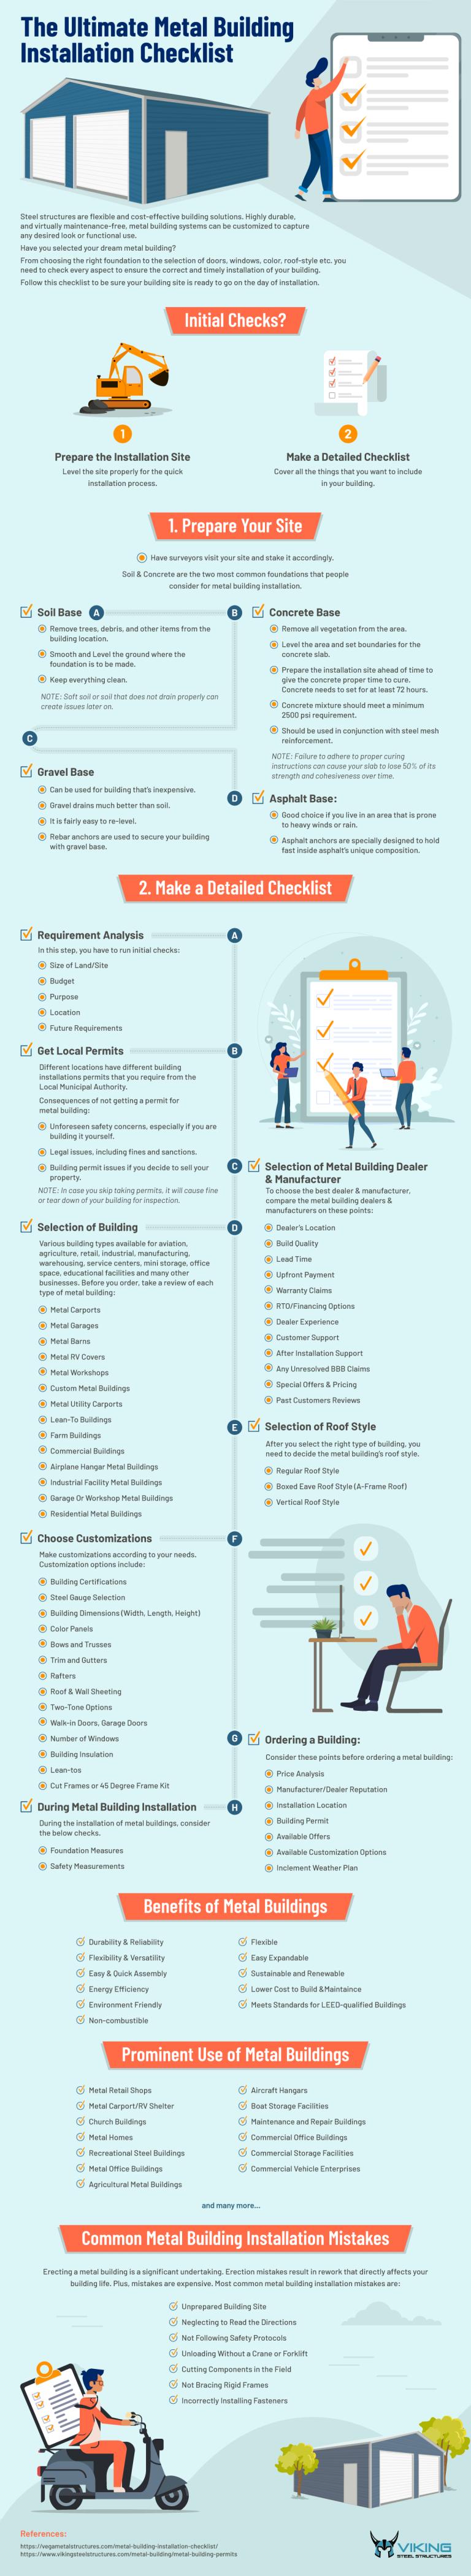 The Ultimate Metal Building Installation Checklist